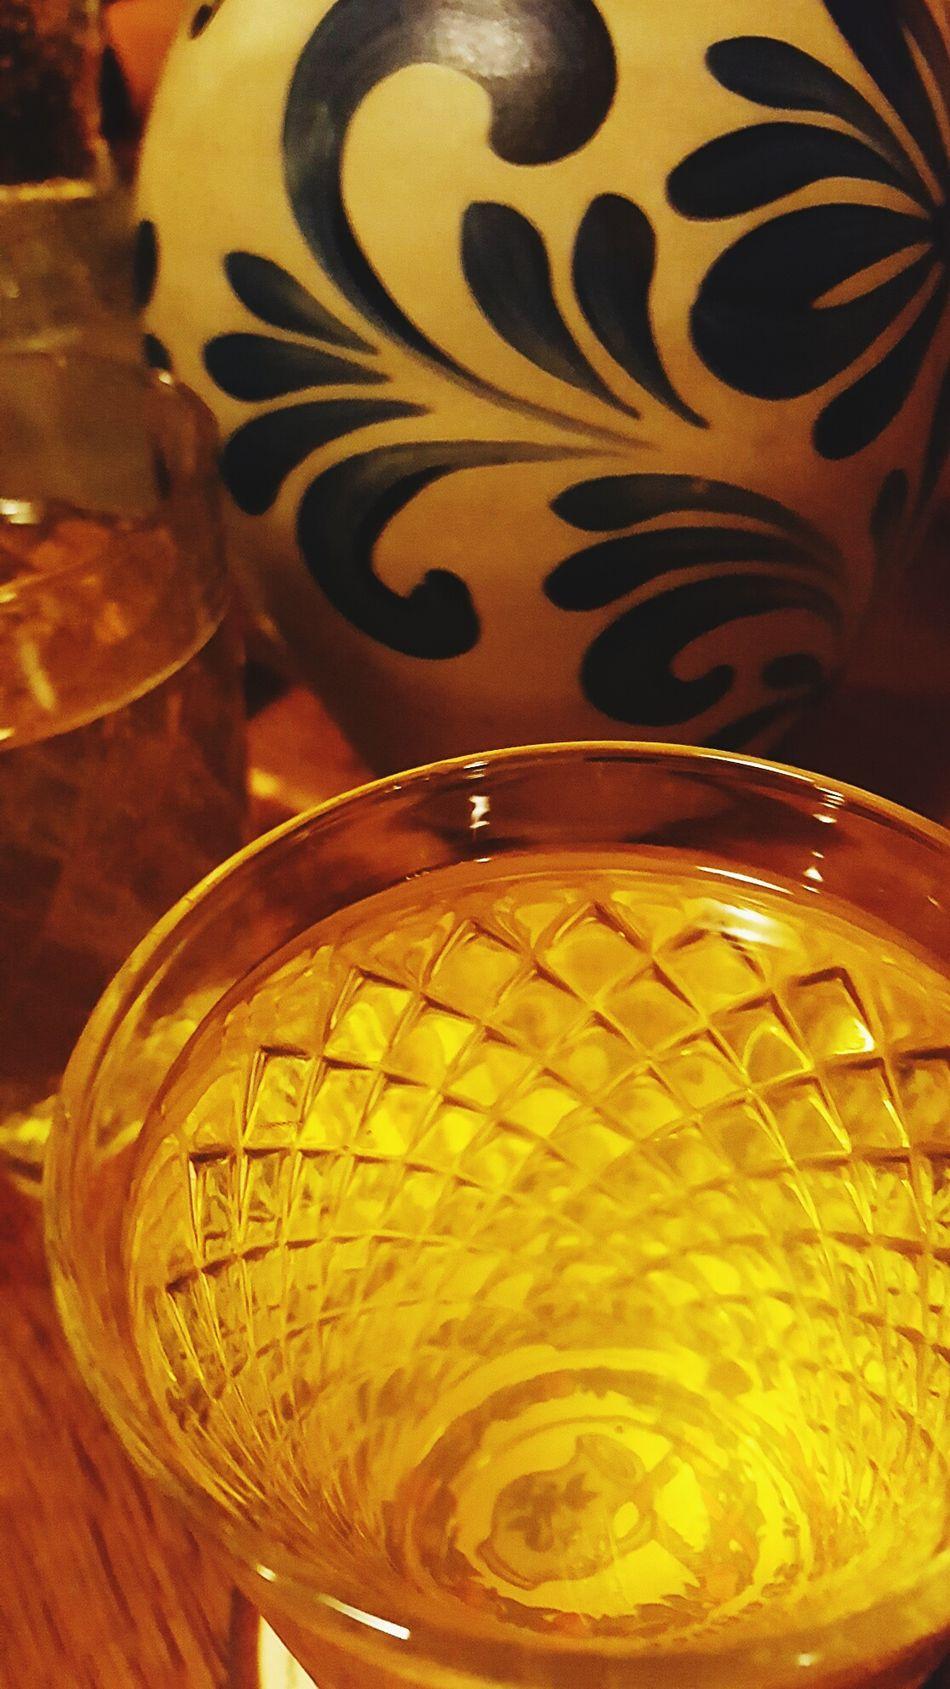 An Fasching darf auch mal tiefer ins Glas geschaut werden... Close-up Gold Colored Gold Yellow No People äppler Apfelwein Frankfurt Frankfurt Am Main Hessen Tradition Regional Bembel Bembeltown Geripptes Hessisch Regionalism Regional Food Drinking Drinking Glass Drinks Krug Pupparazzi Happiness